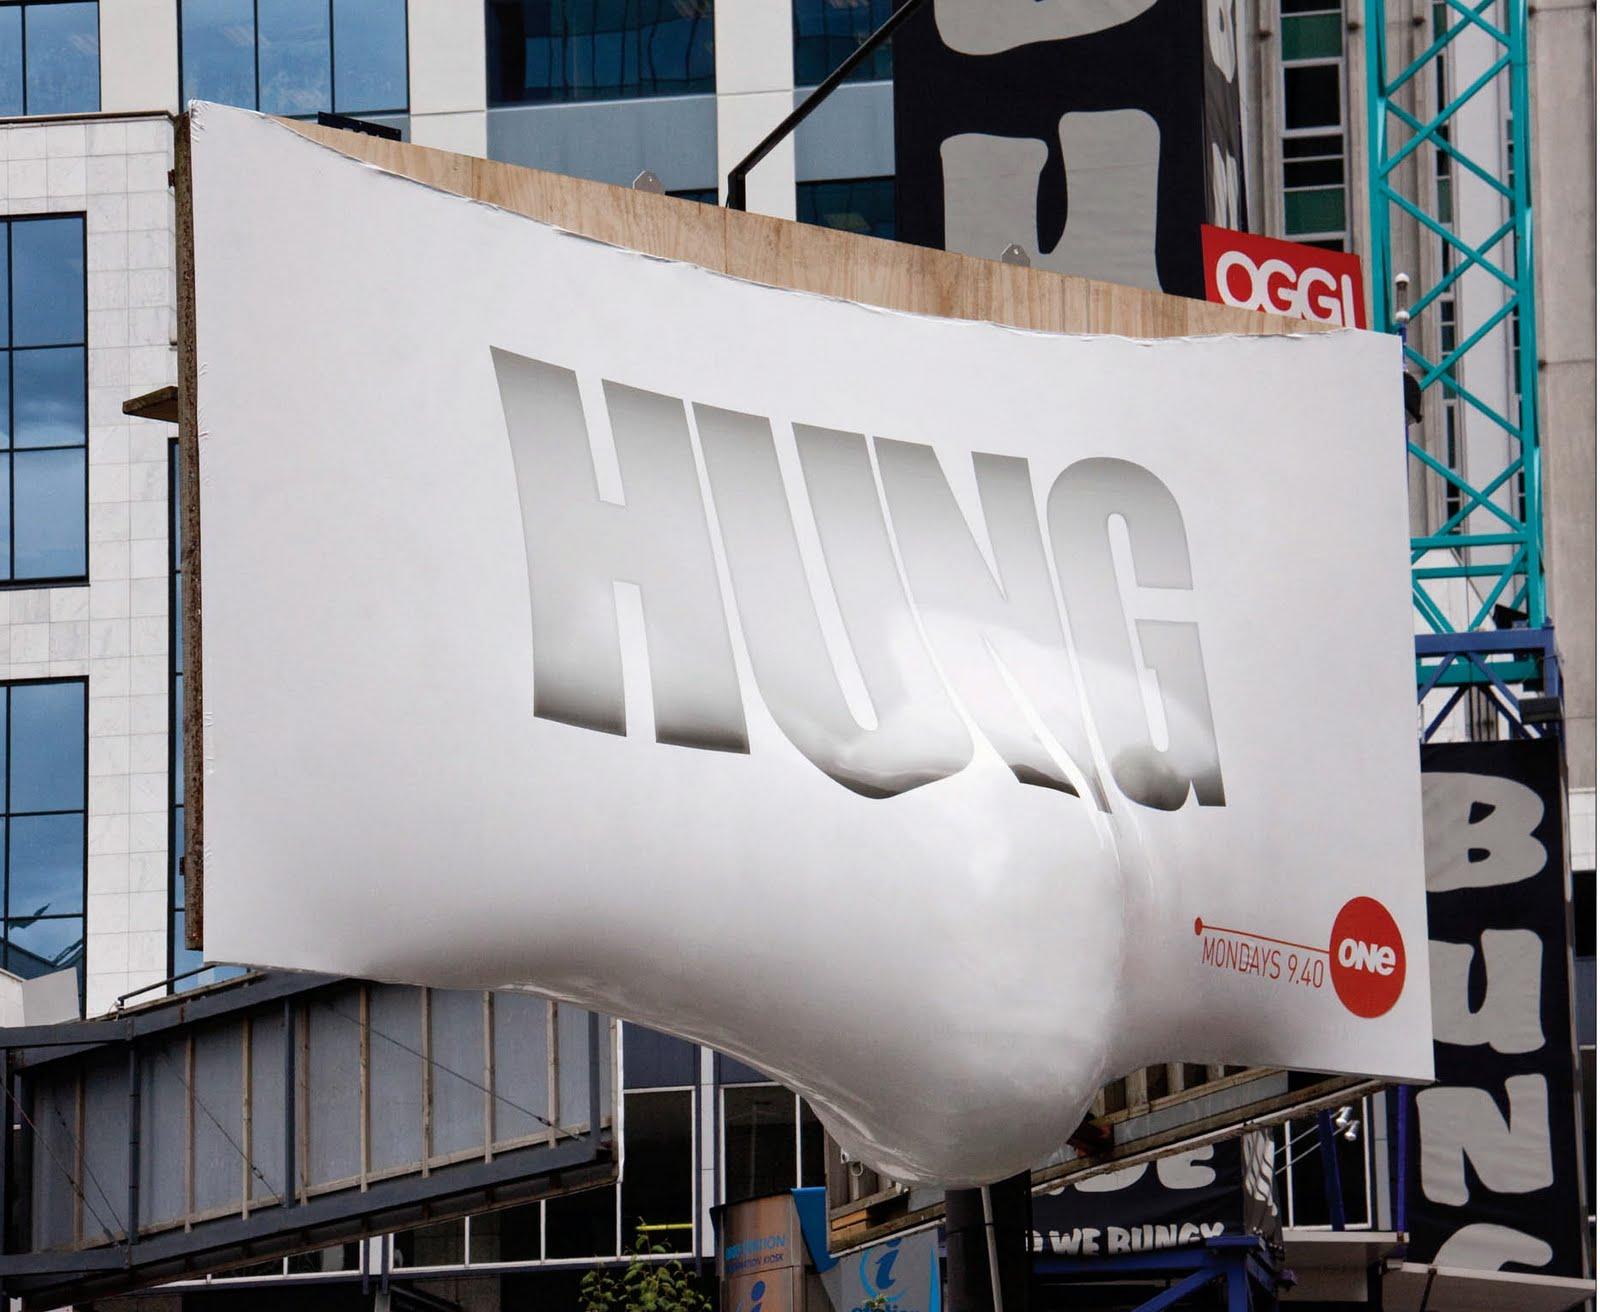 Hung billboard